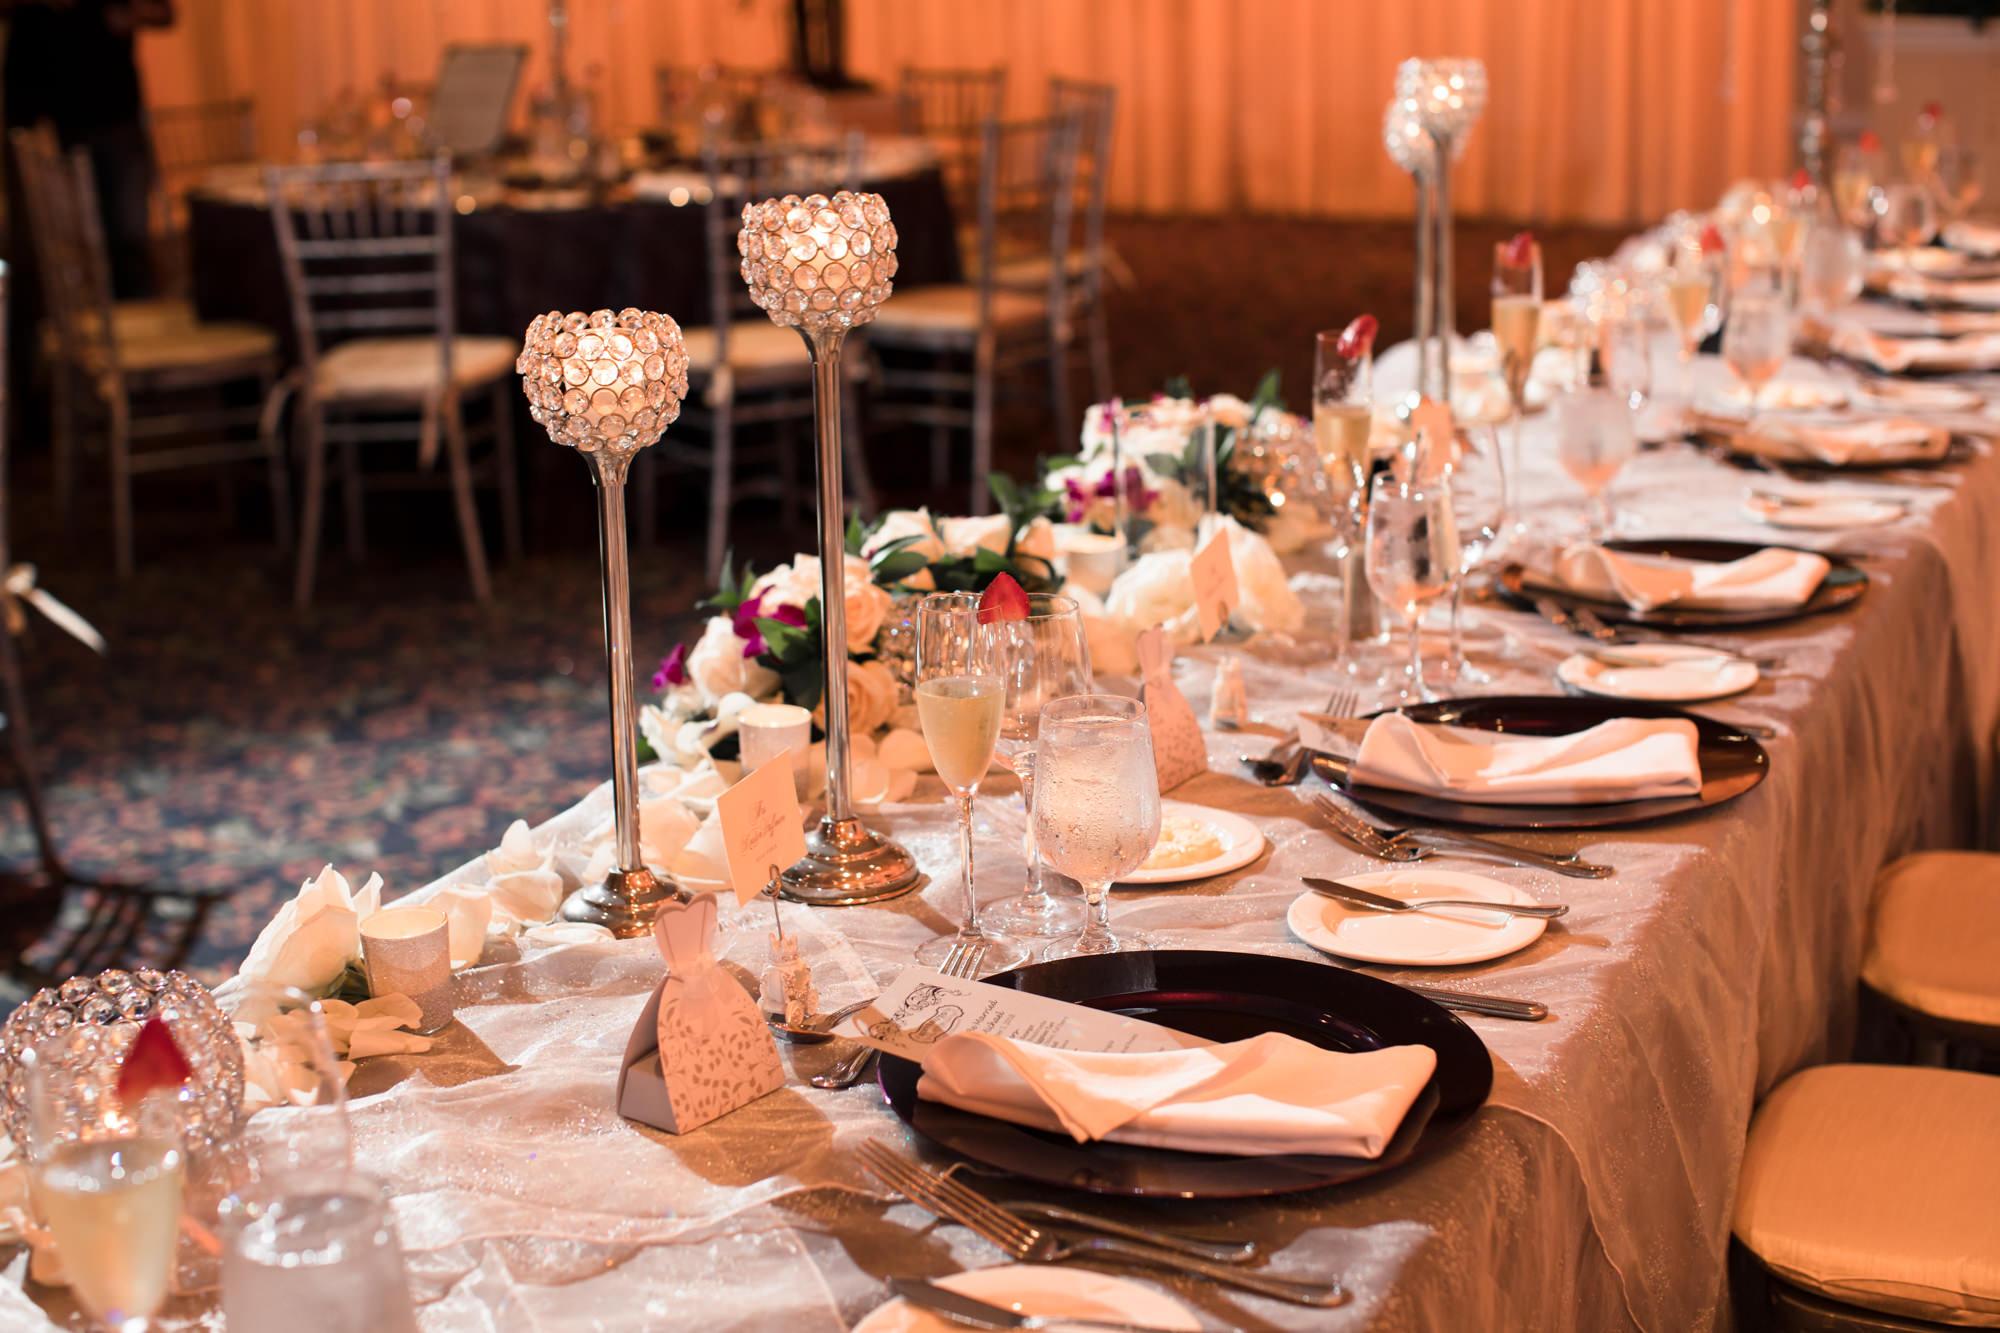 Benvenuto_Wedding_catholic_Florida_Bride-Groom-99.jpg